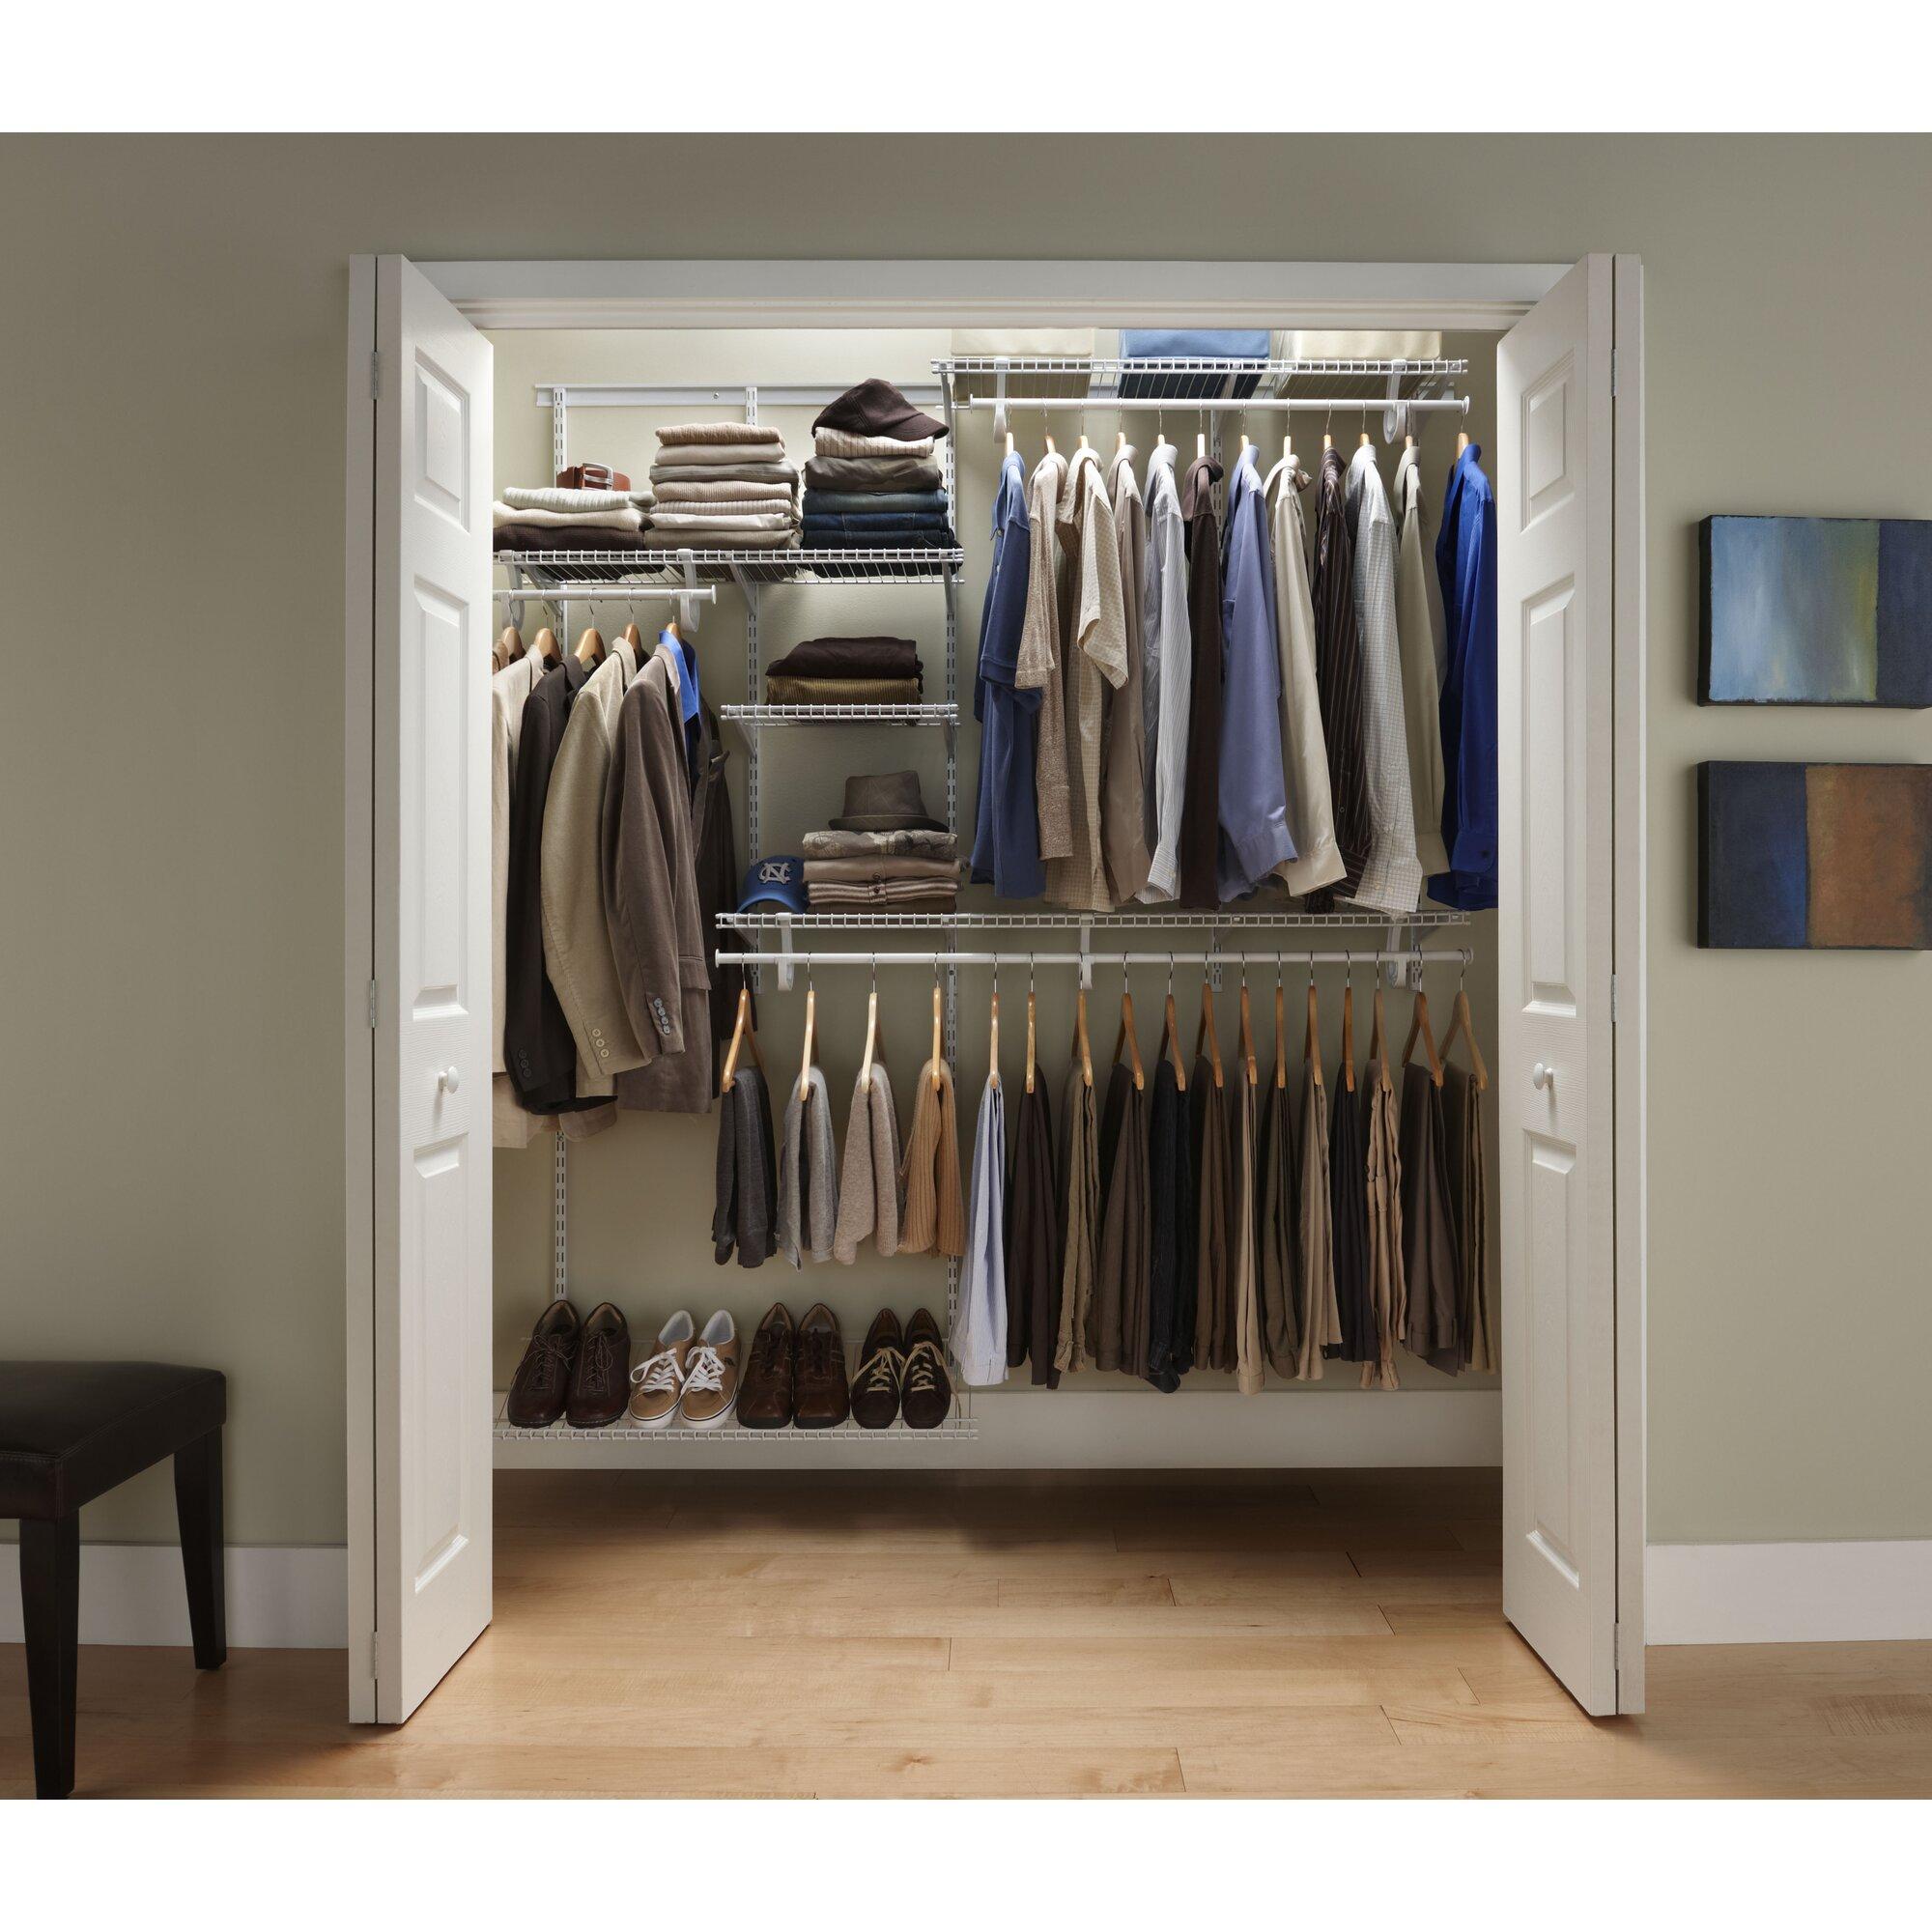 Day Beds Ikea Closetmaid Shelftrack 60 Quot W 96 Quot W Closet System Amp Reviews